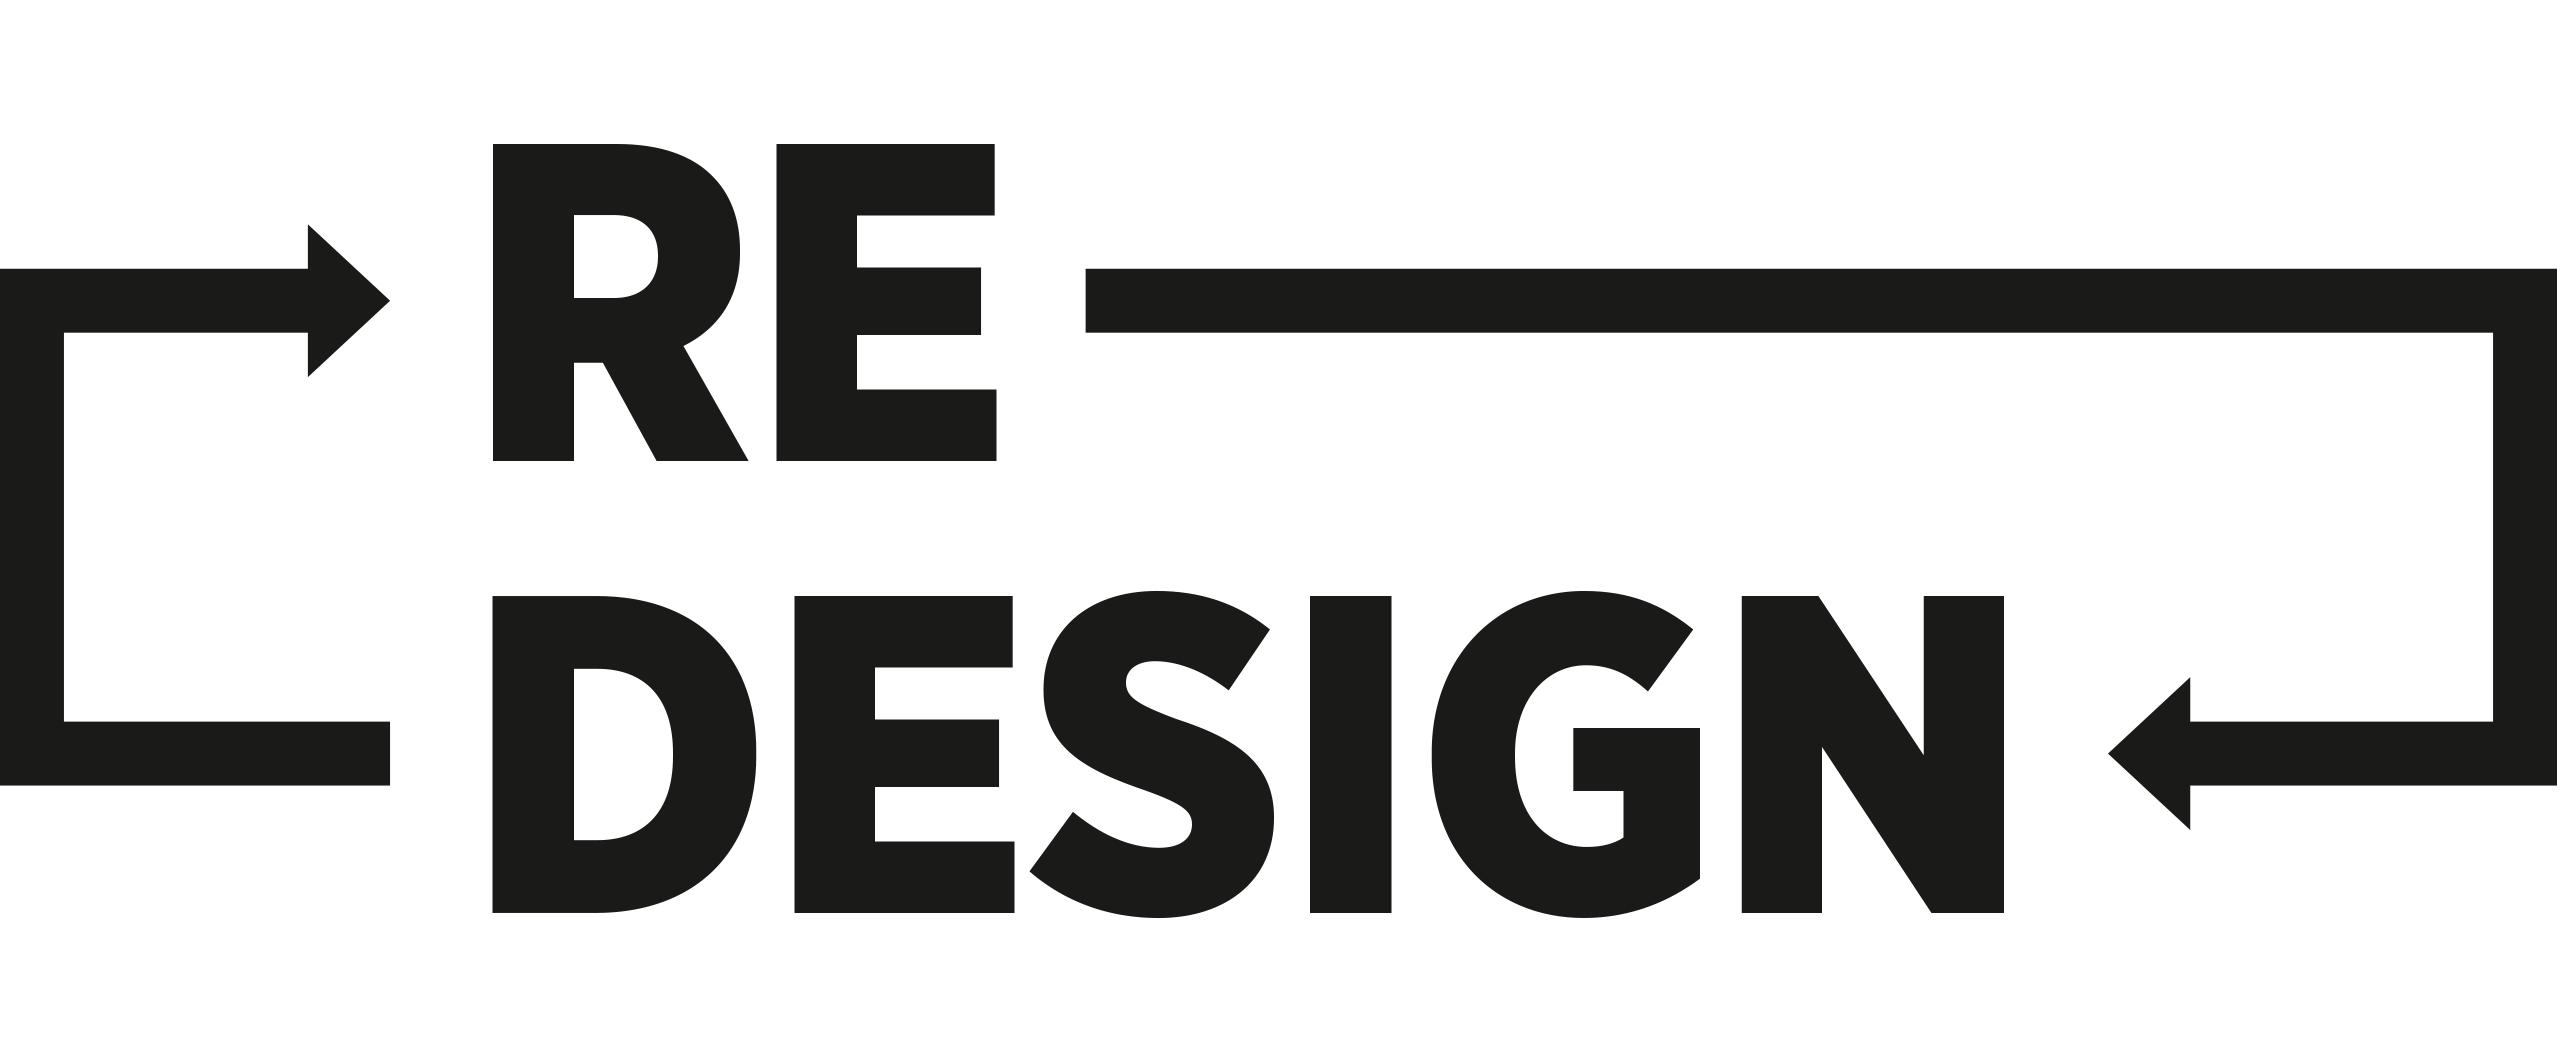 Grenke Redesign Logo Bourdonné Design